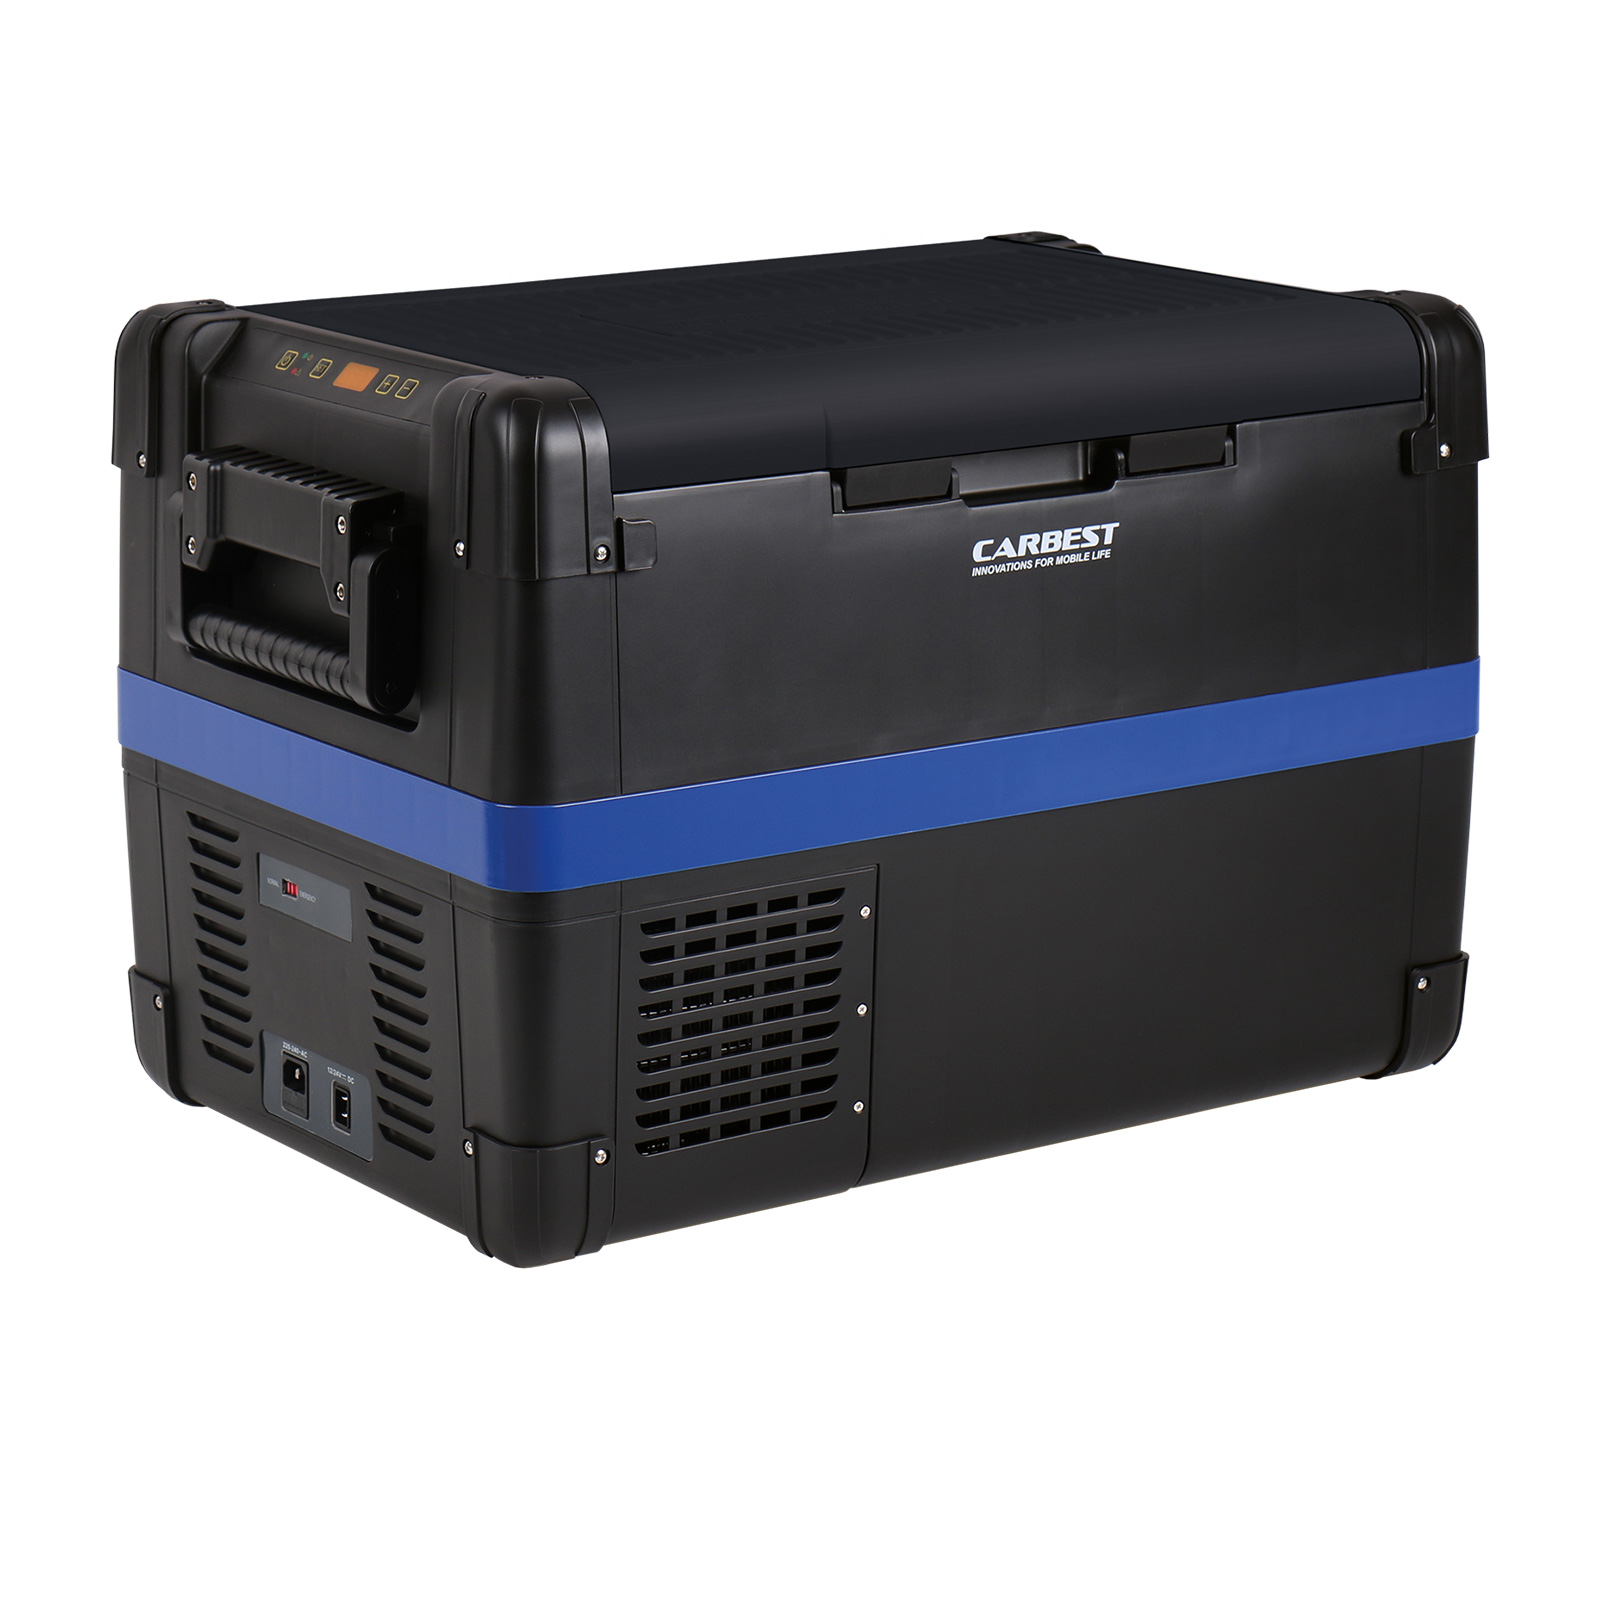 Carbest Kompressor-Kühlbox 50 Liter 12V/24V/230V, Kühlbox Carbest MaxiFreezer 50